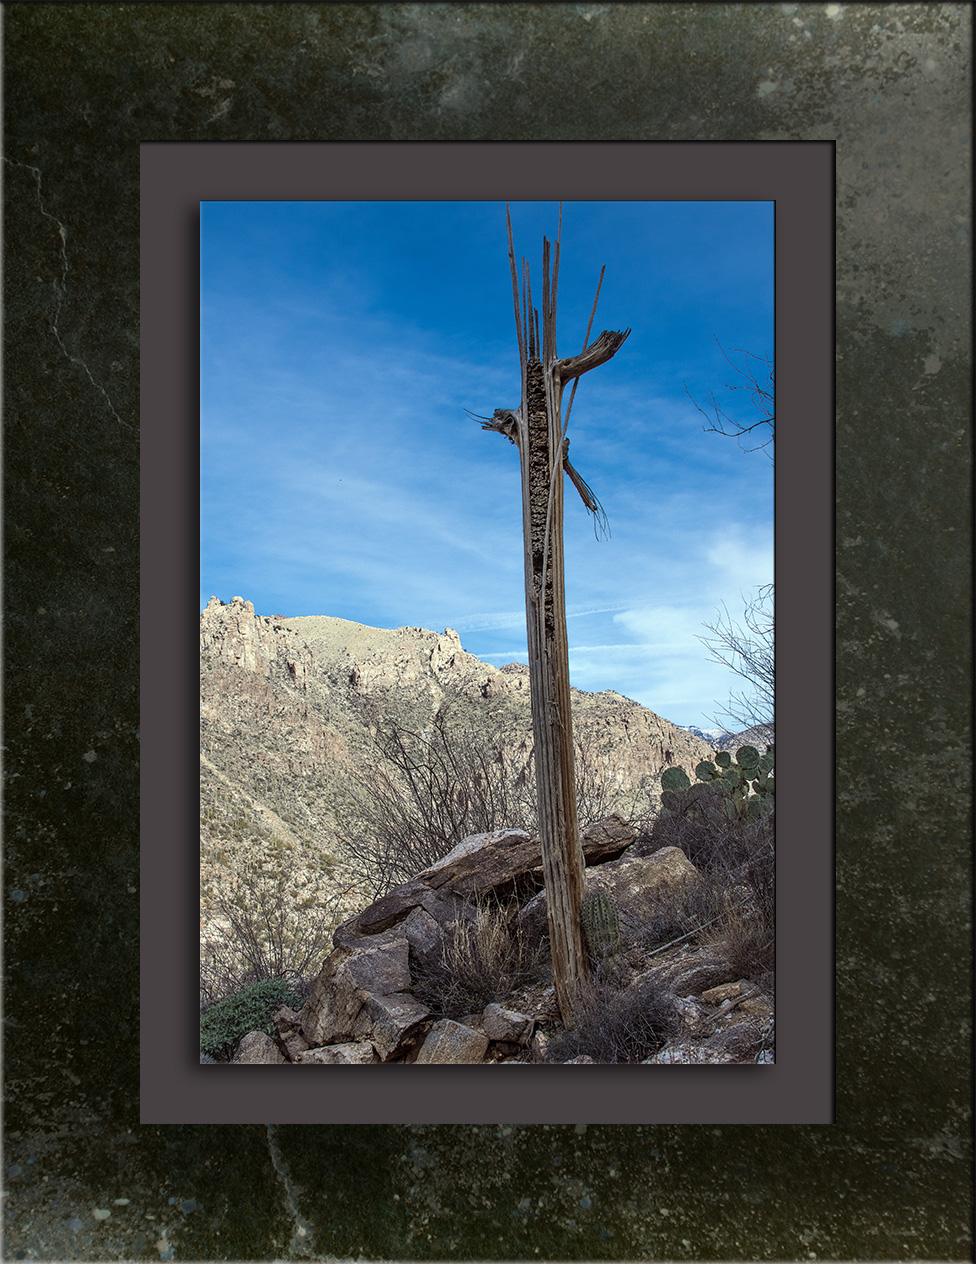 phoneline-trail-0629-blog-framed